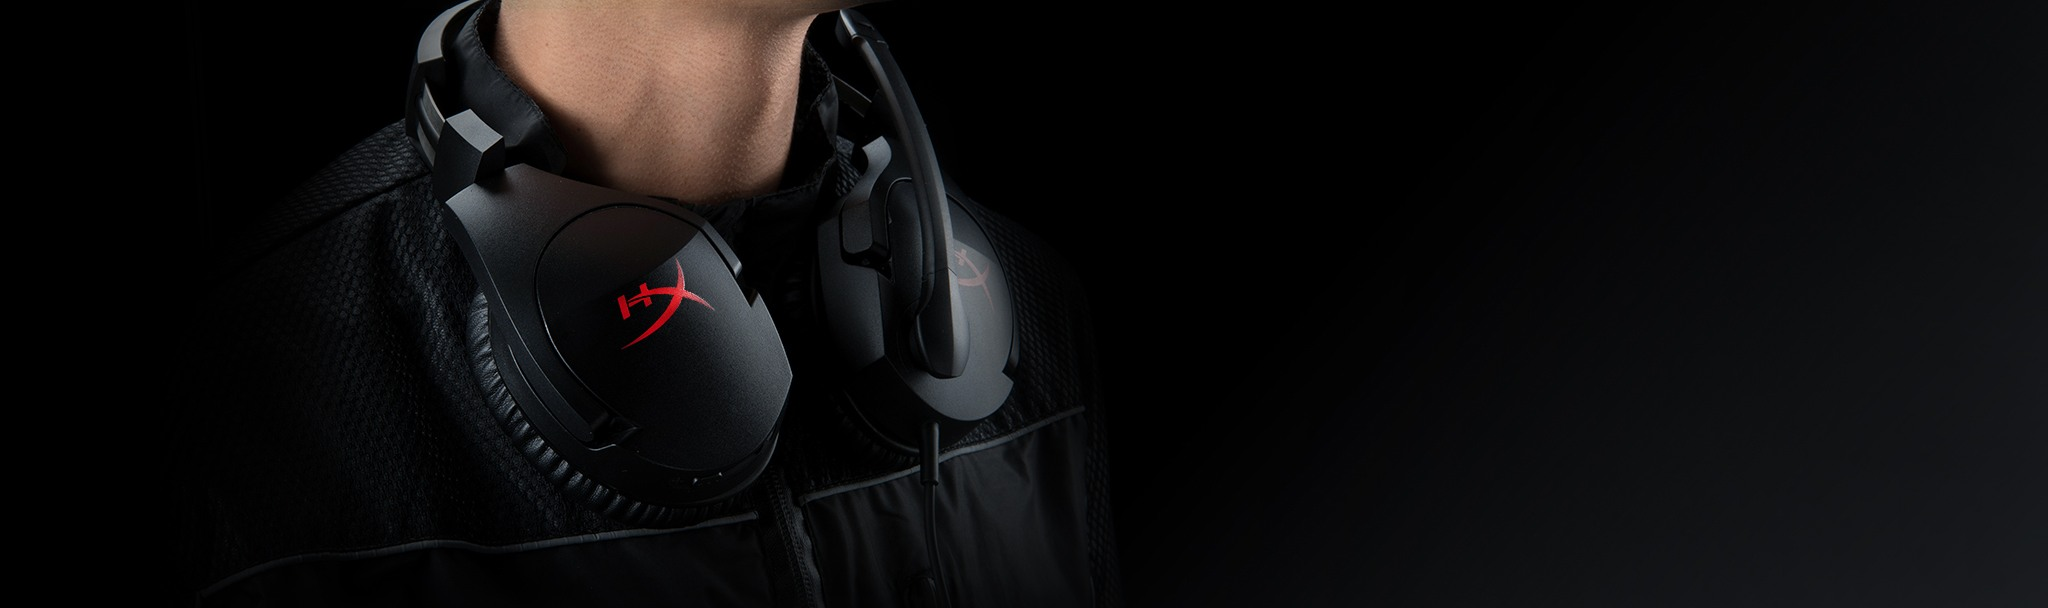 hx-keyfeatures-headset-stinger-2-lg